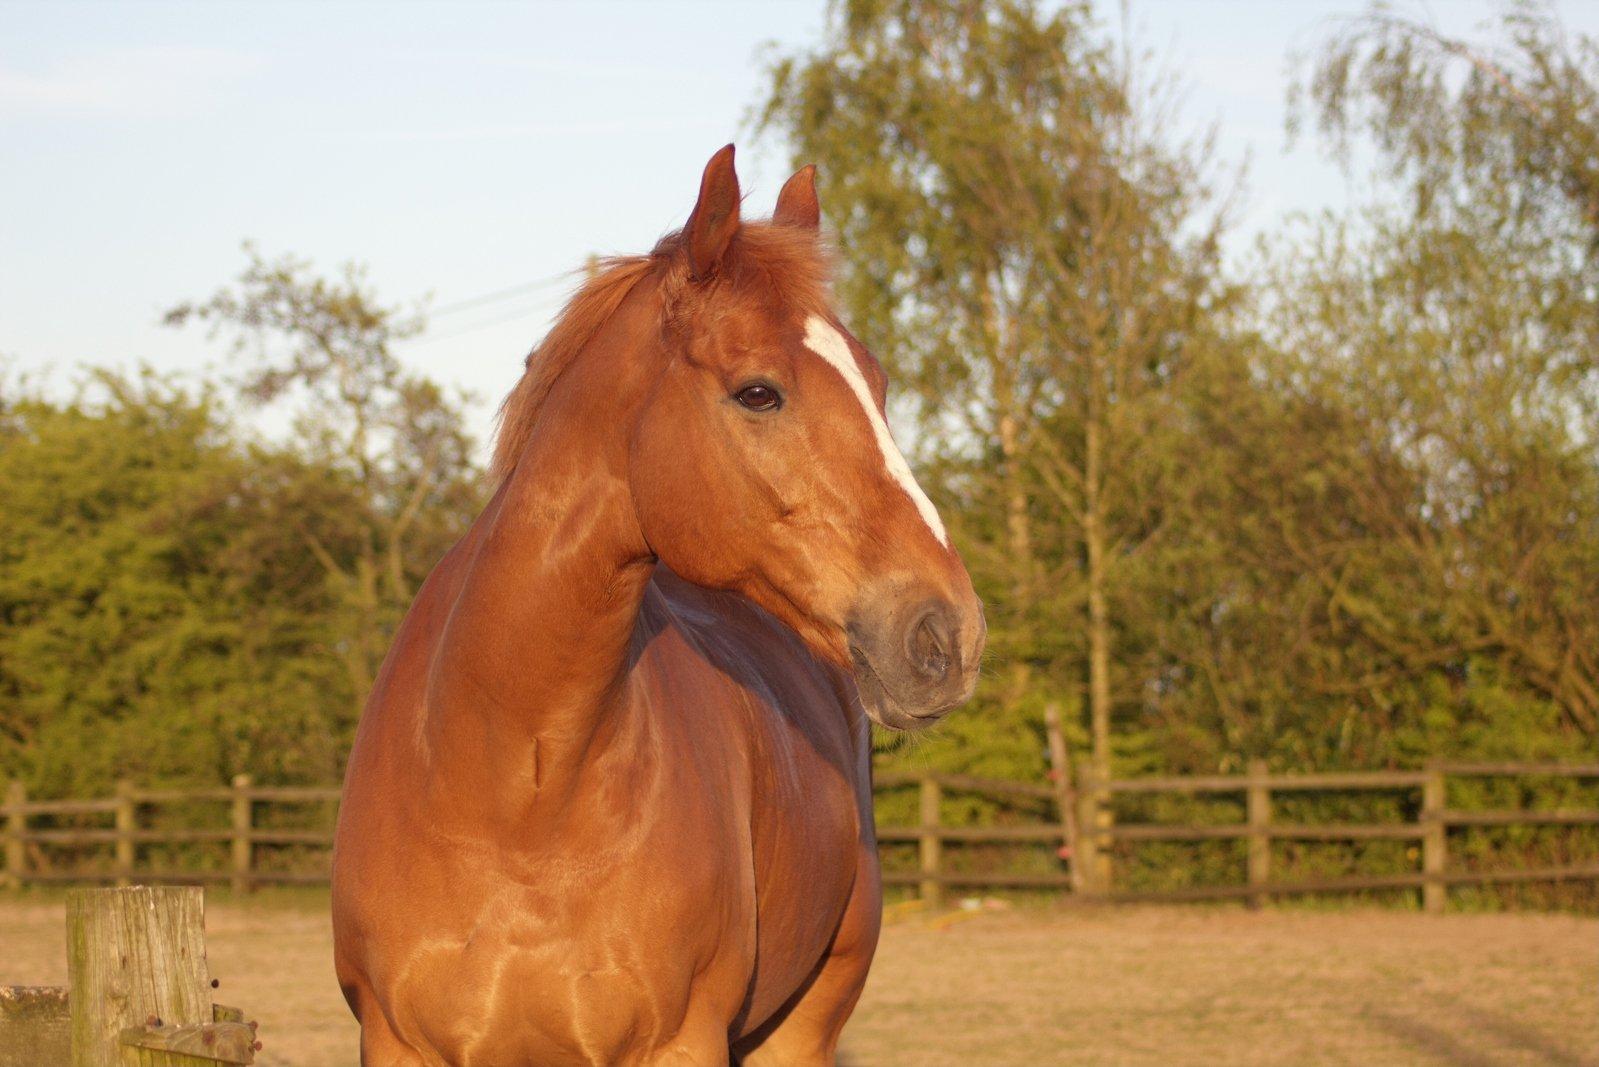 Free Chestnut horse Stock Photo - FreeImages.com - photo#42